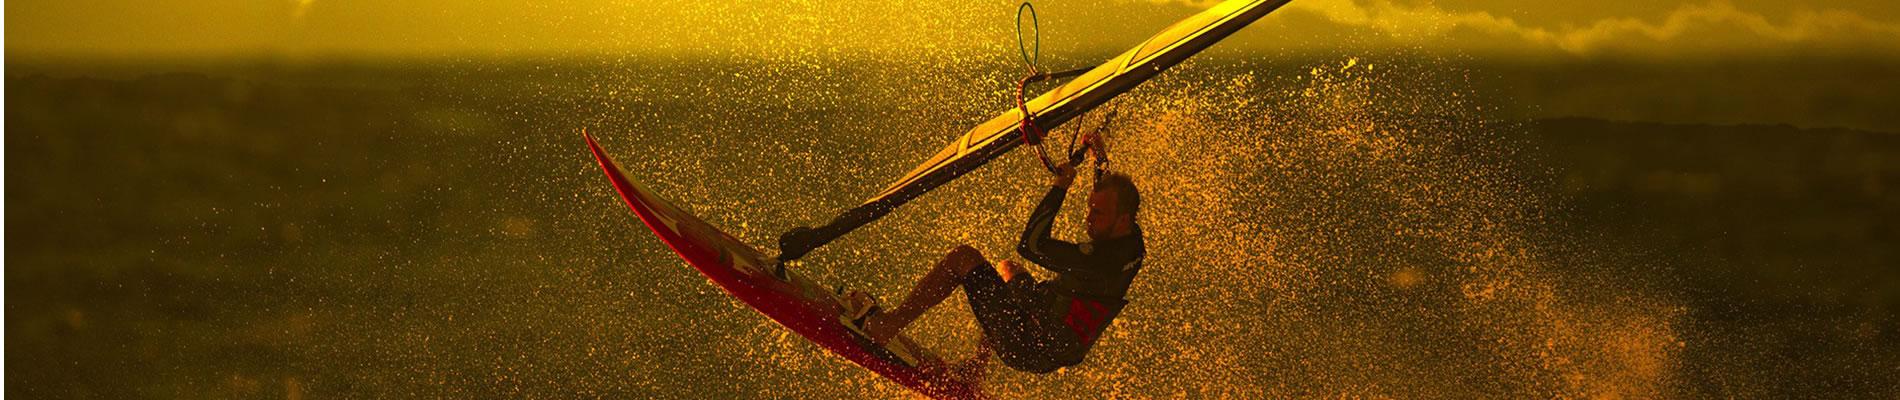 Kite e windsurf